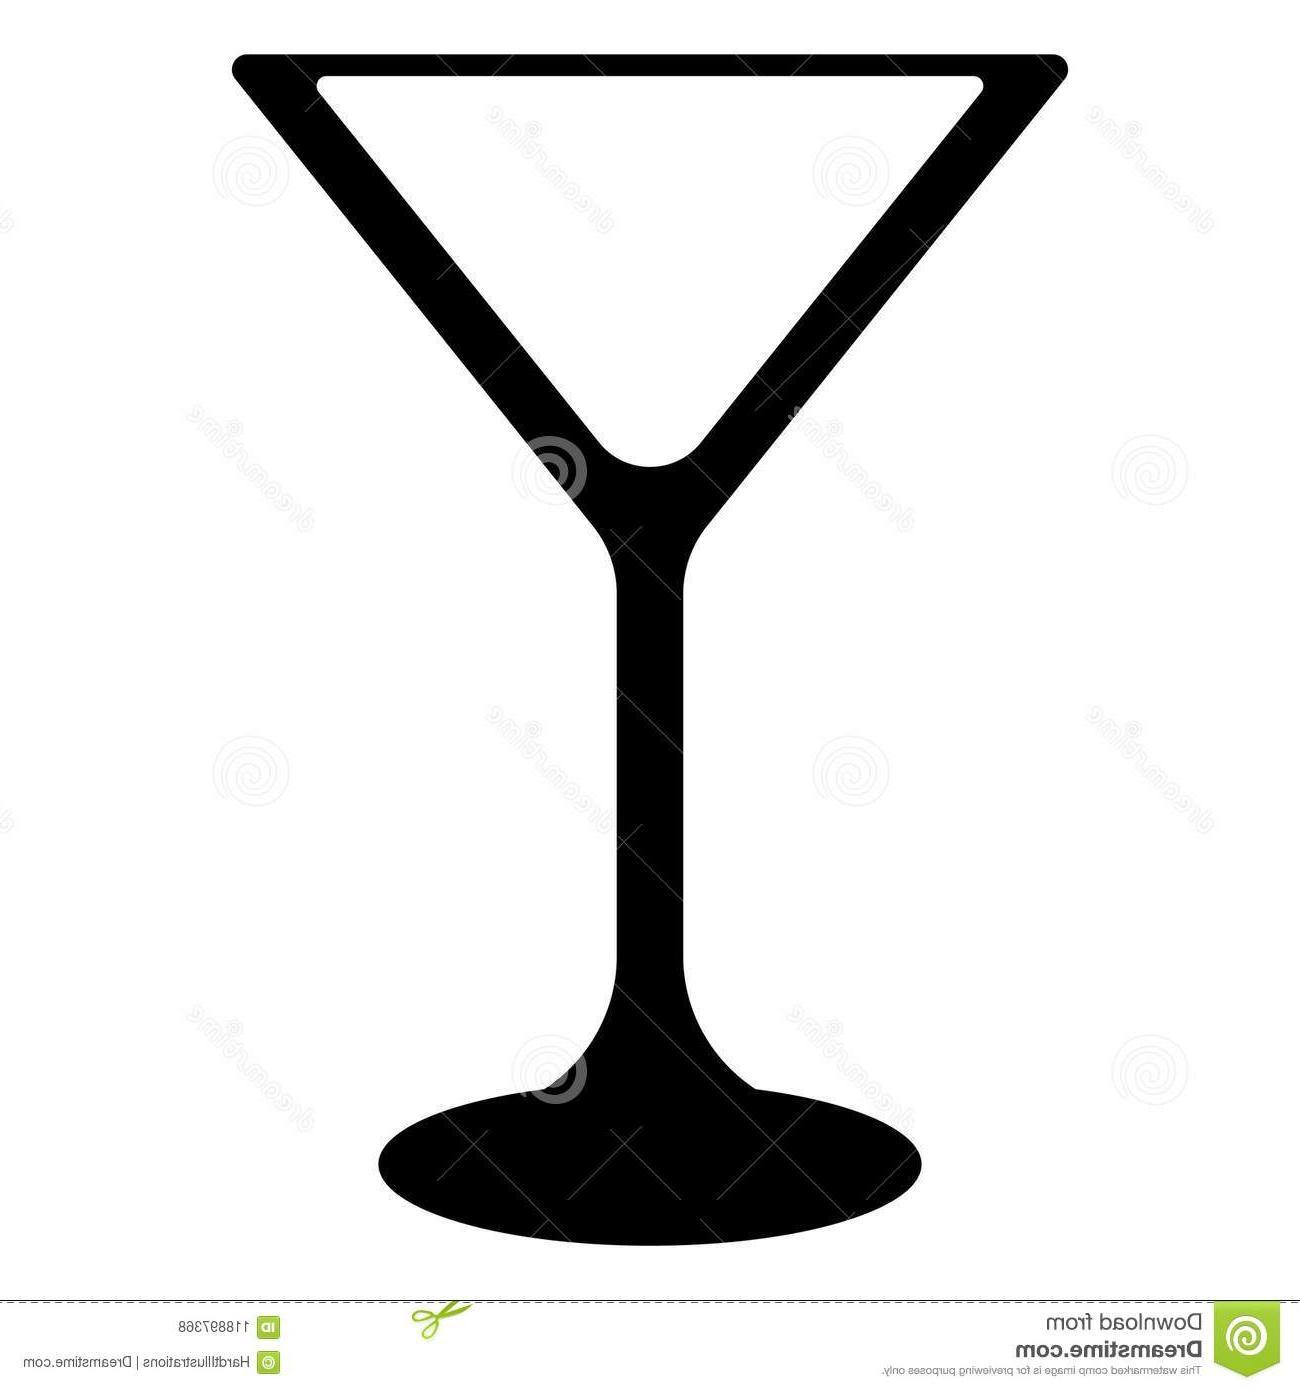 Black martini glass clipart clipart Best HD Martini Glass Clip Art Black And White Images » Free Vector ... clipart